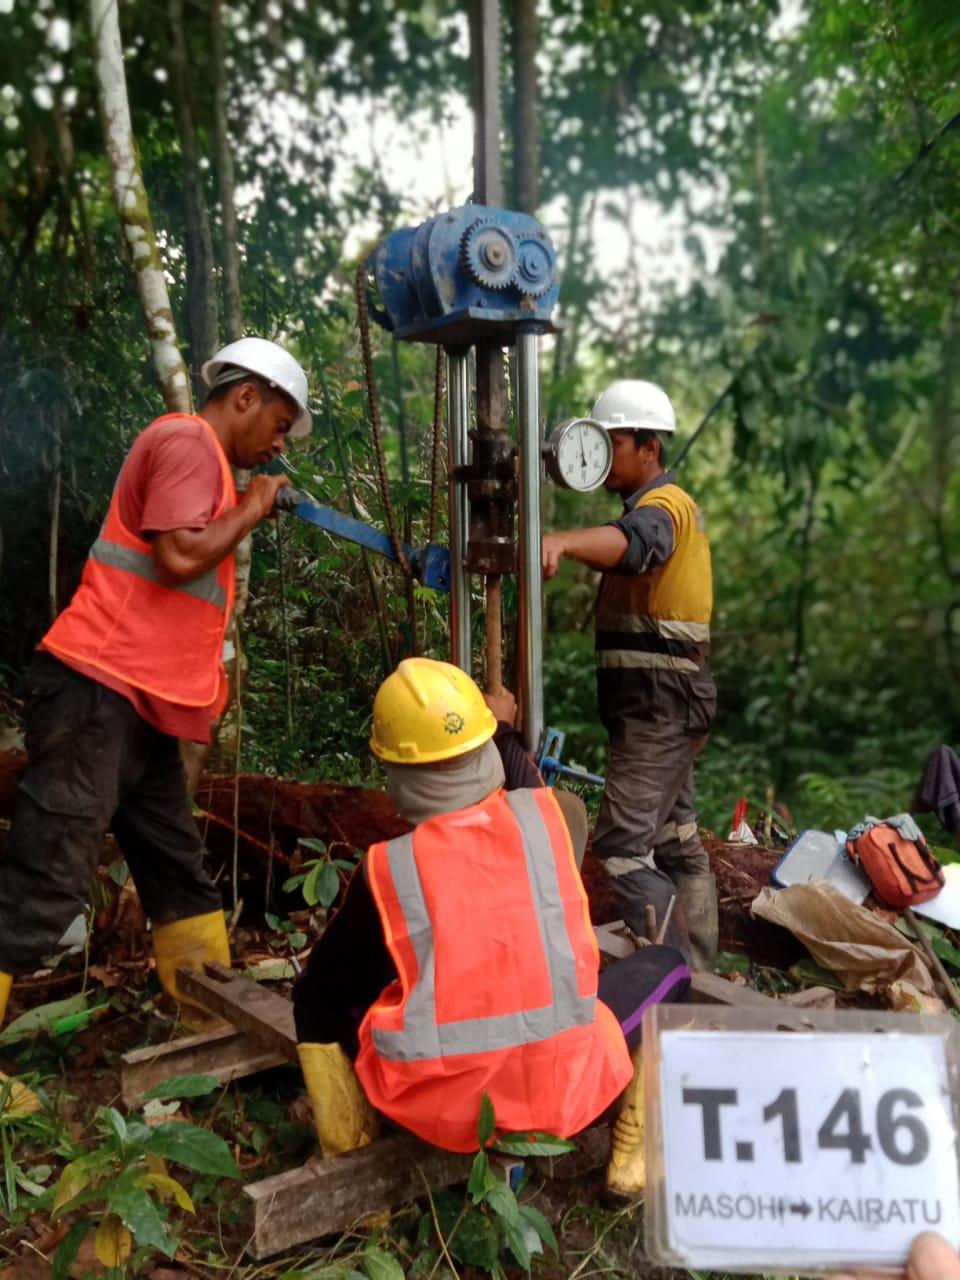 PT. BUMI INDONESIA melayani jasa sondir  dan Bor SPT keseluruh wilayah Indonesia